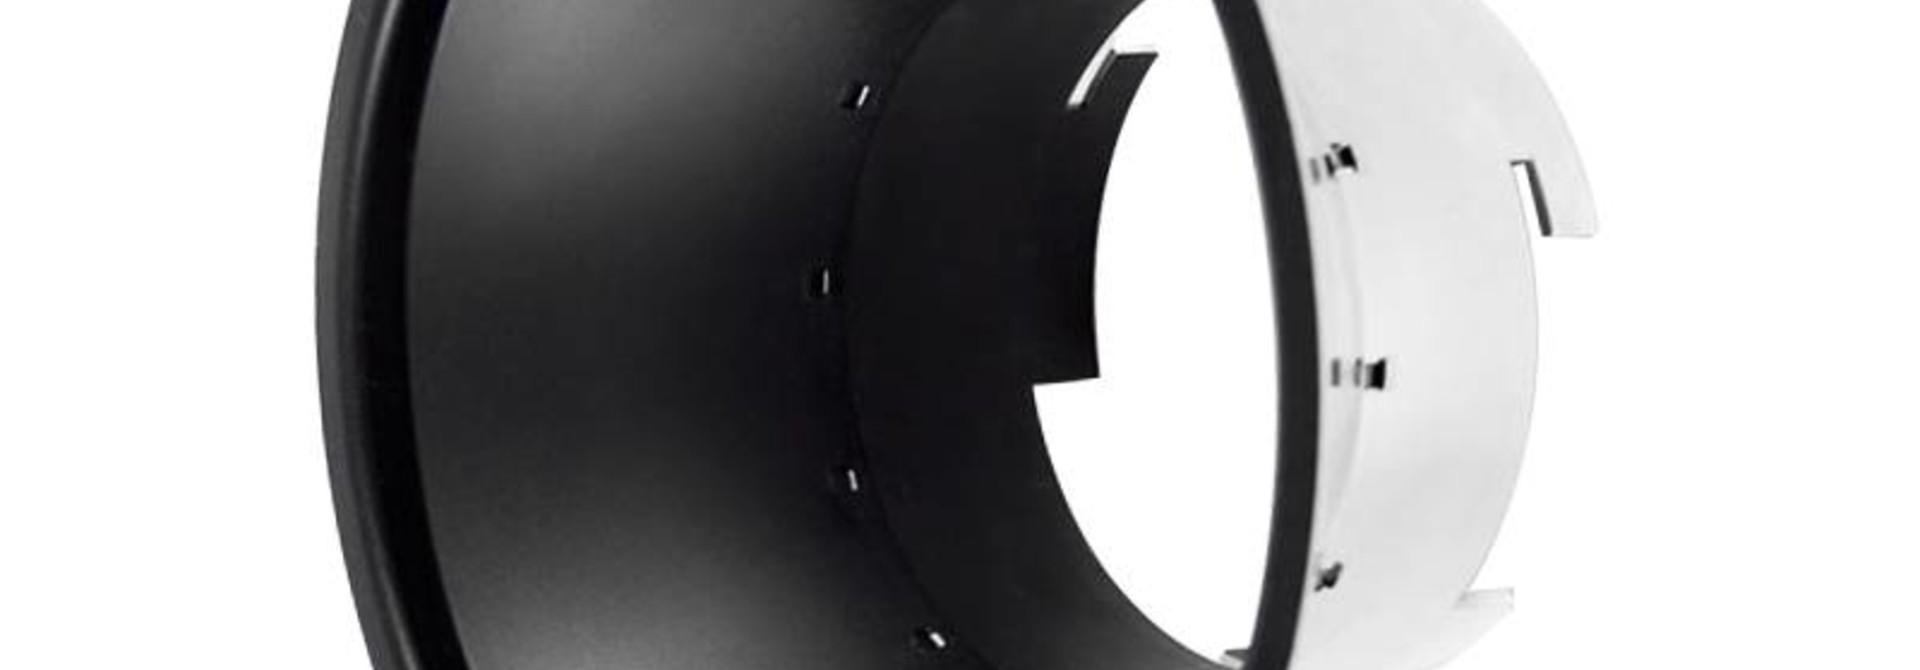 Aim-Through Reflector for Moon Units